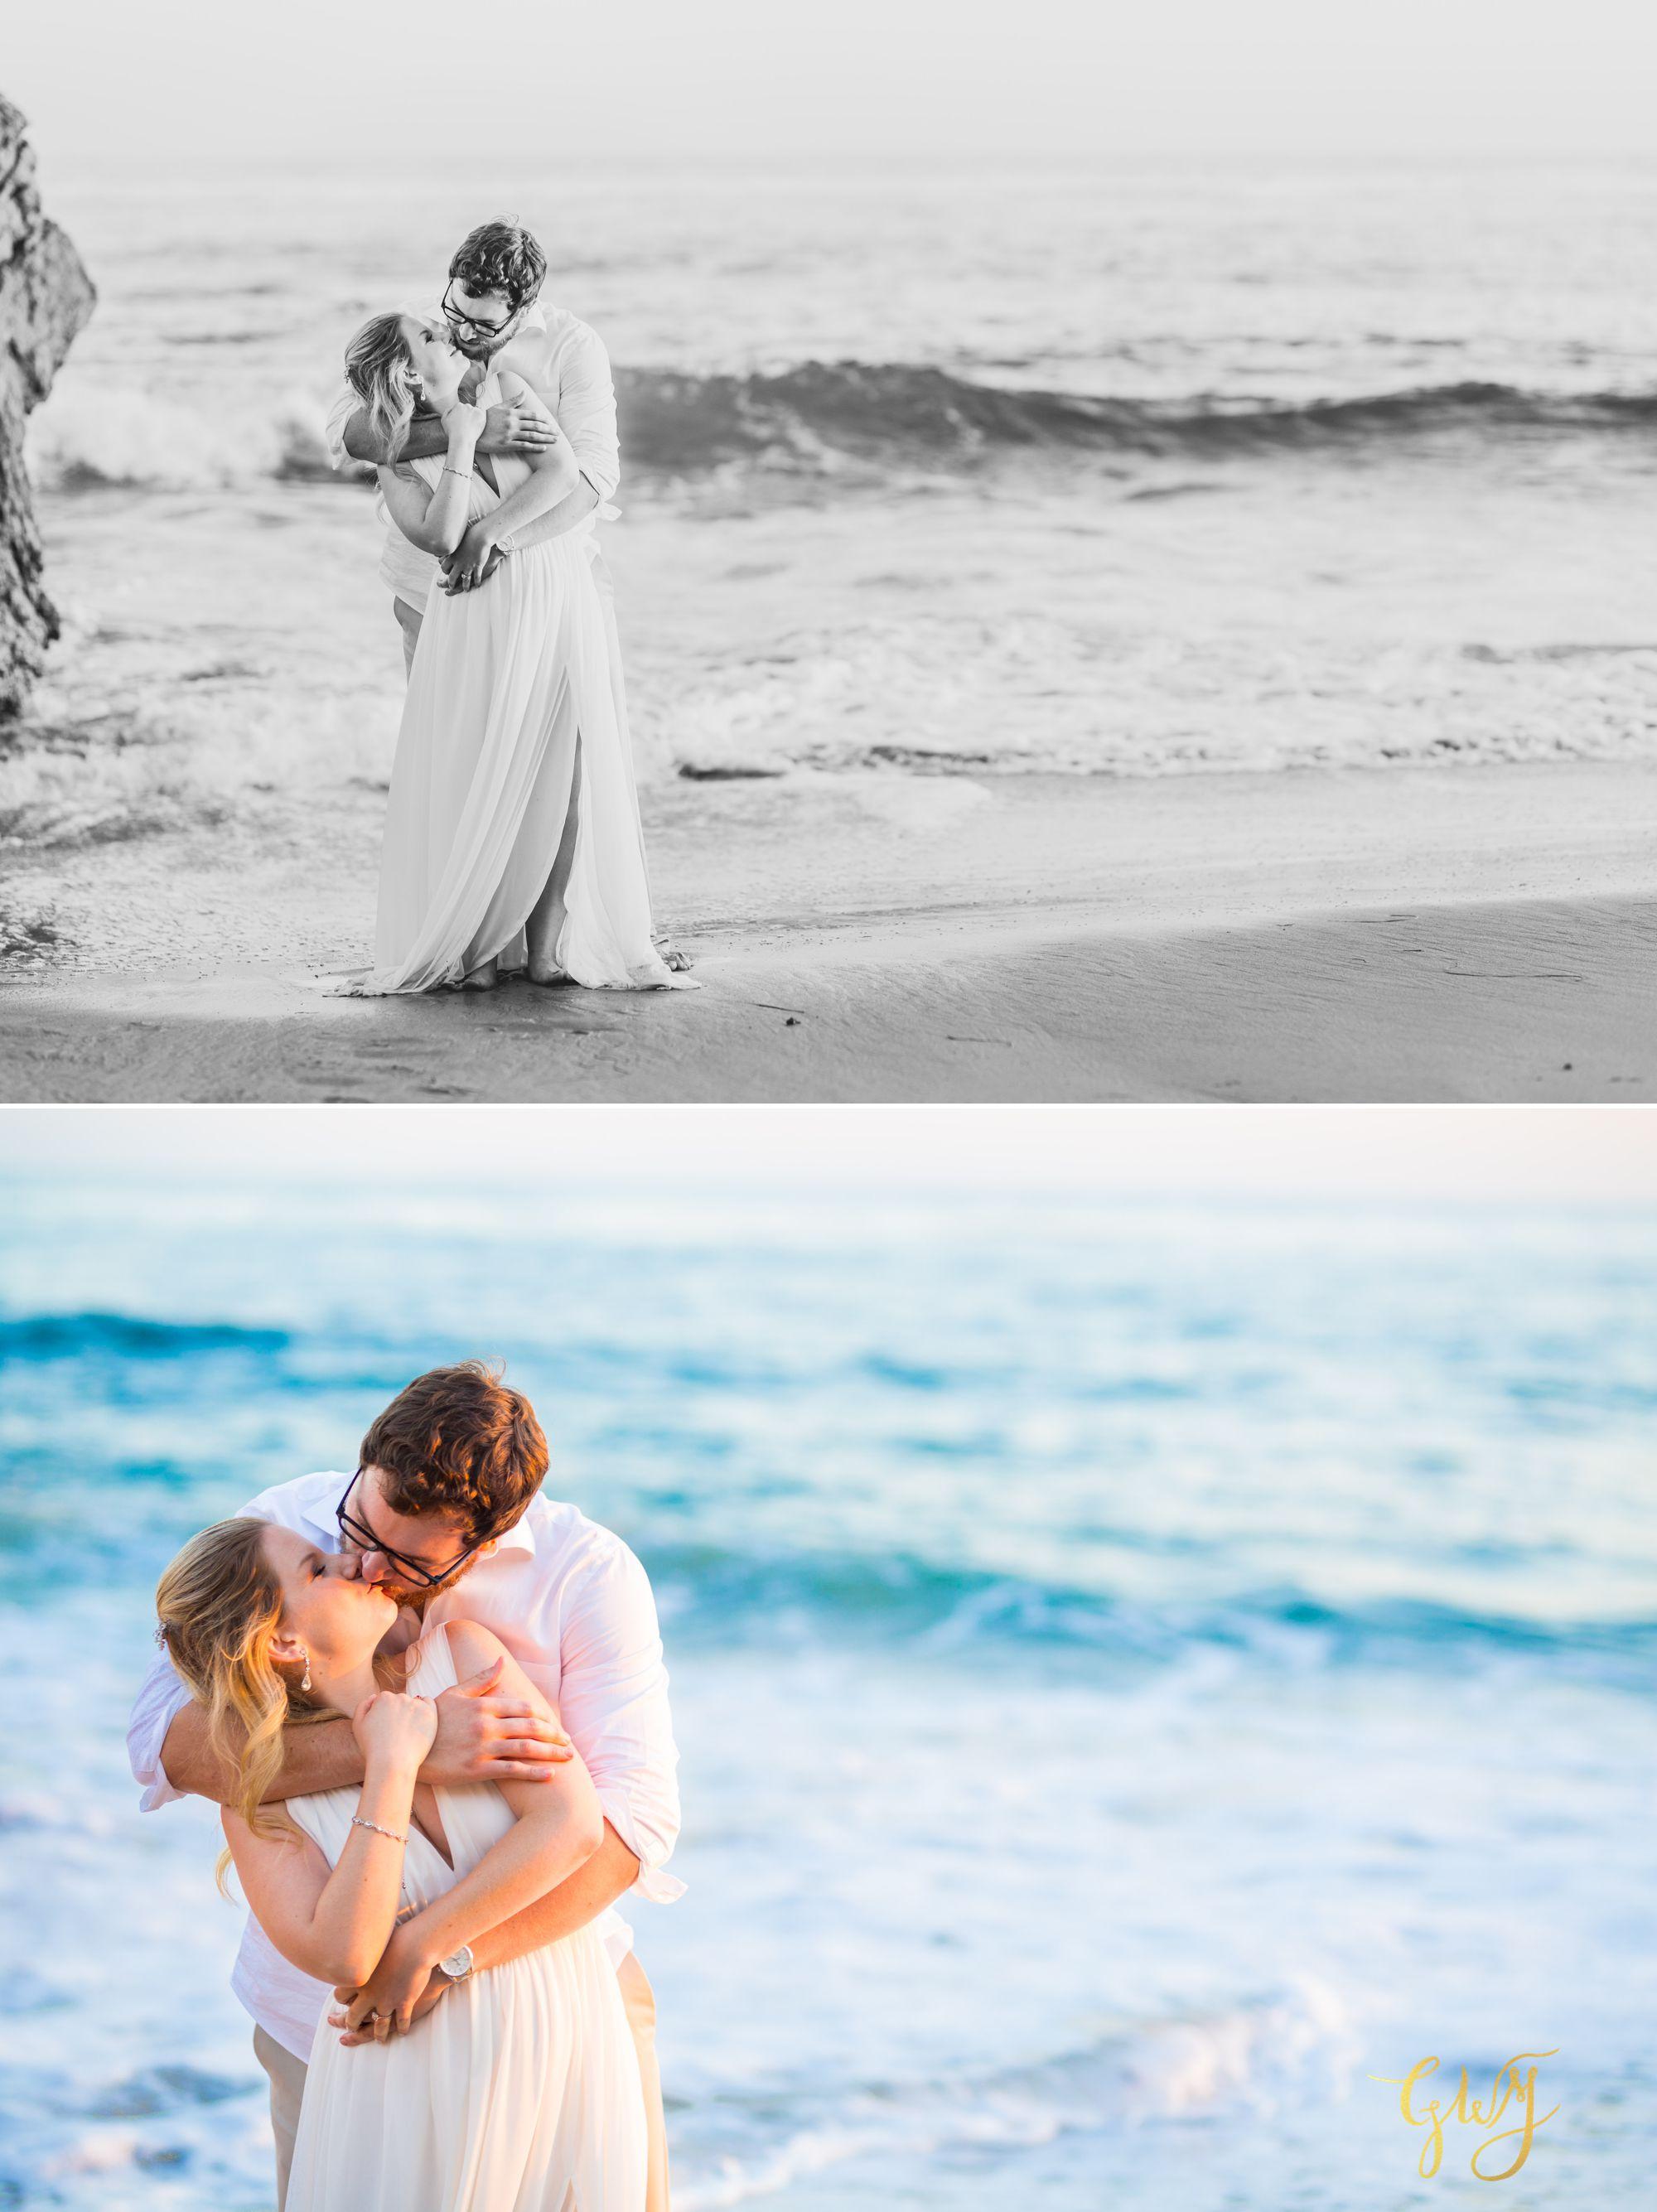 Amanda + Joe Reef Point Crystal Cove Newport Beach Sunset Romantic Intimate Elopement by Glass Woods Media 16.jpg